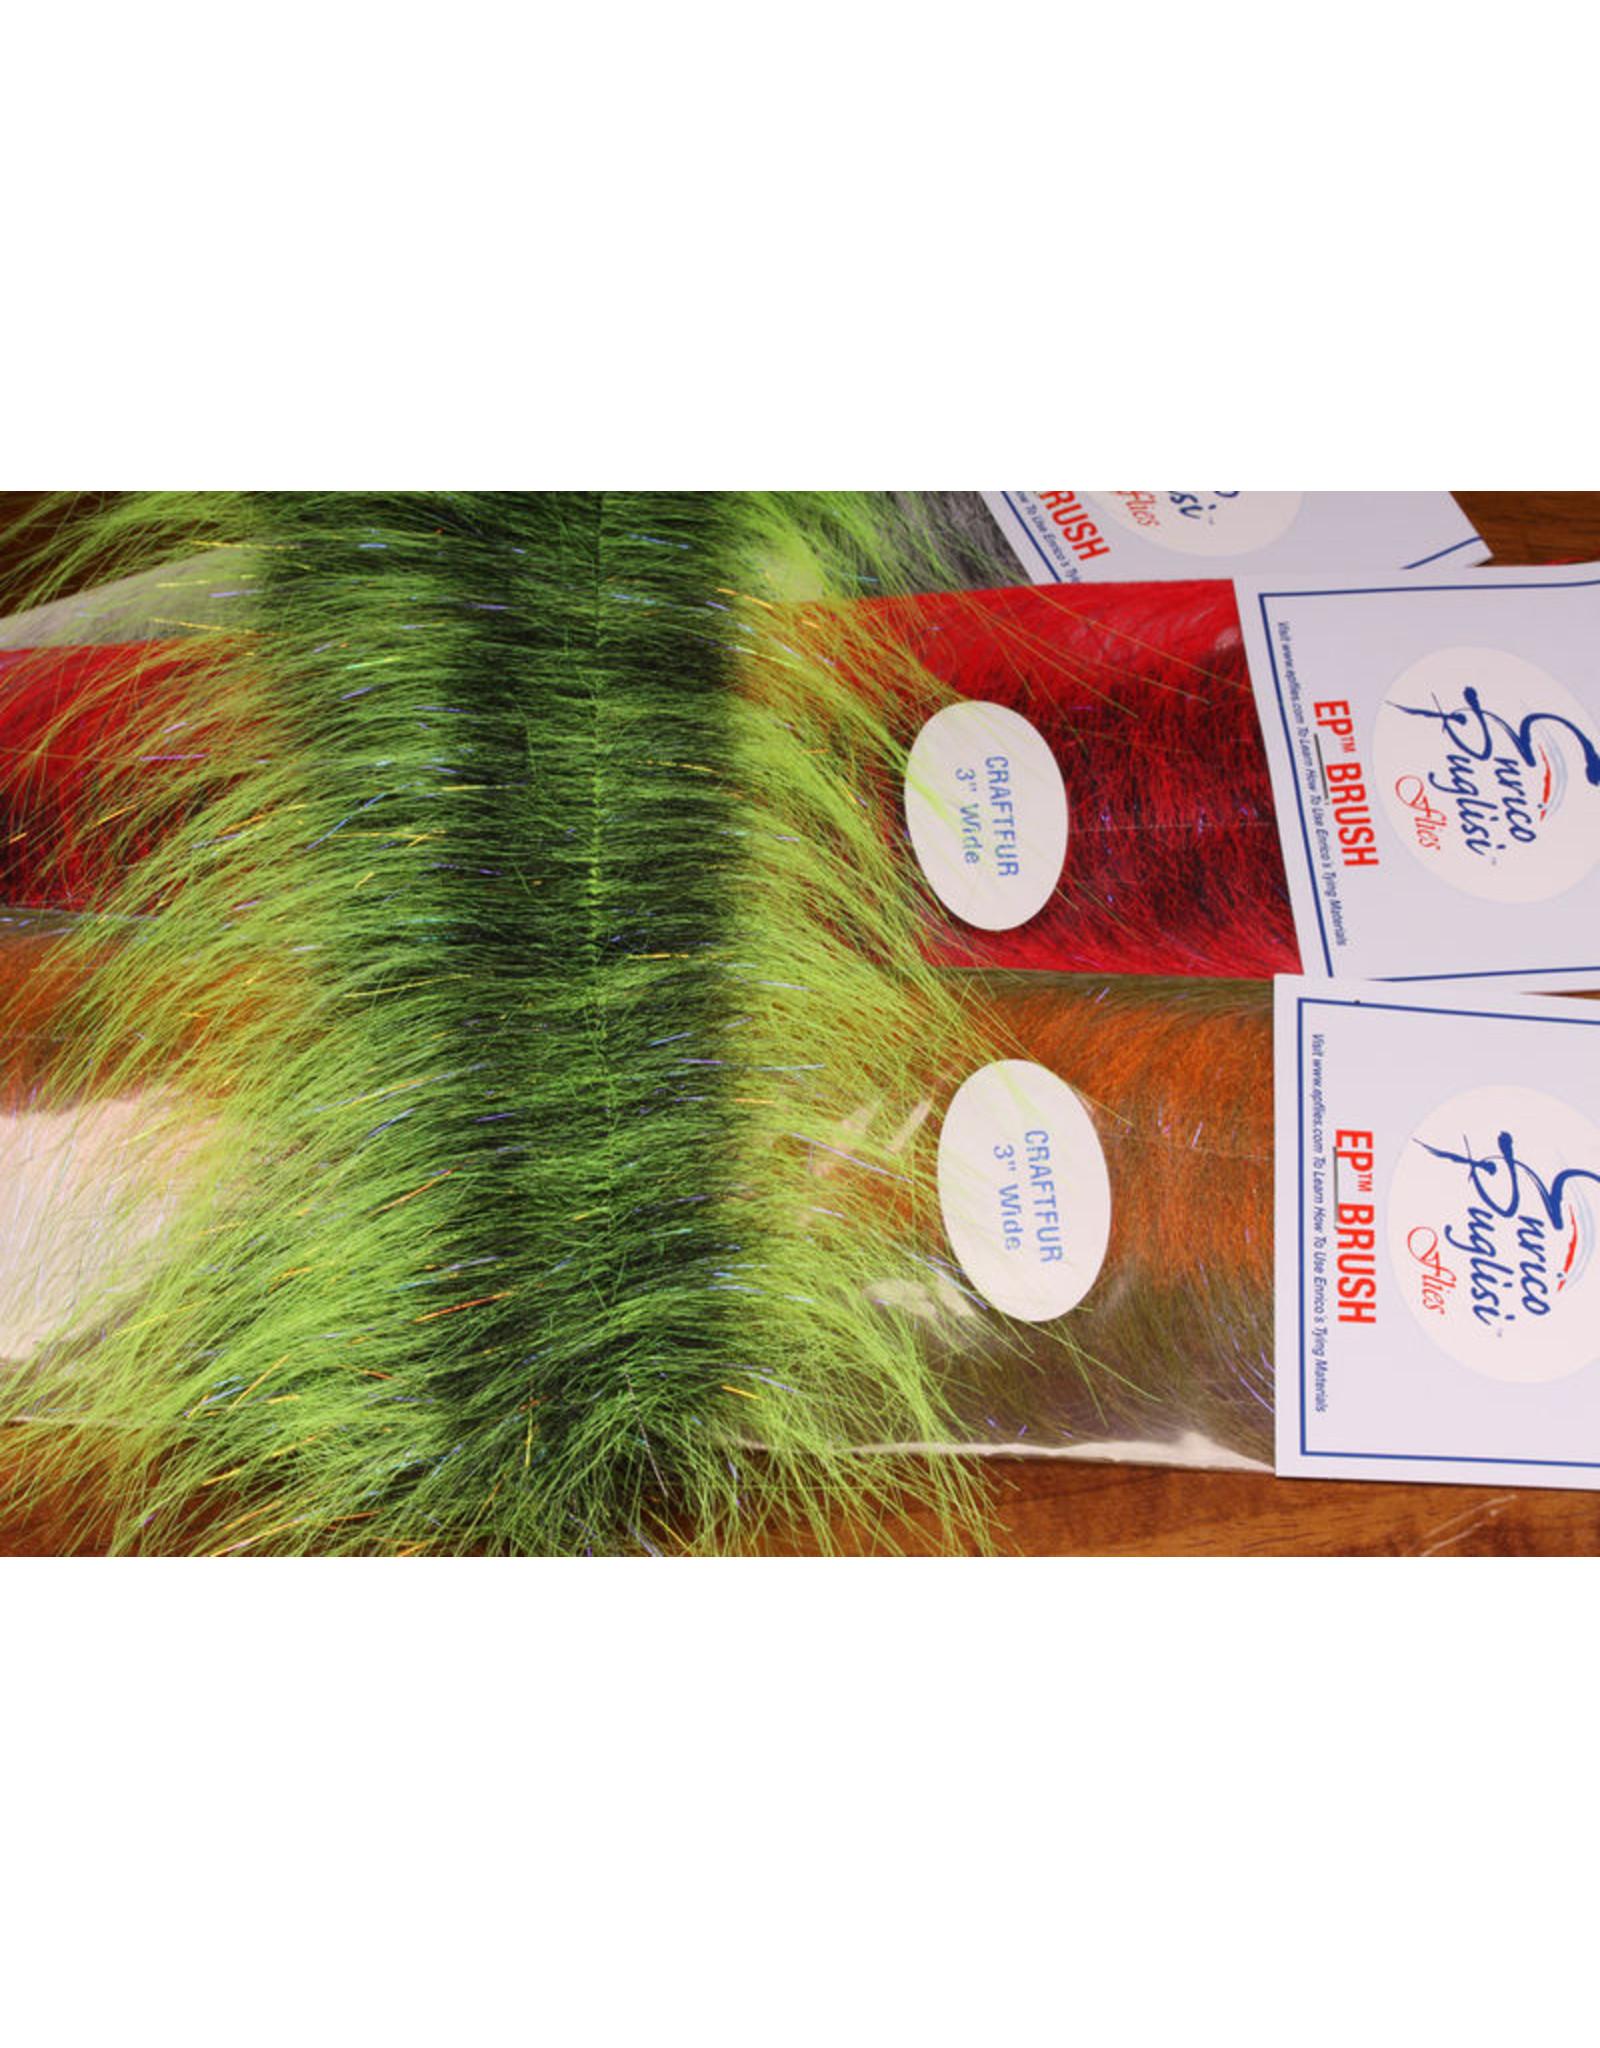 "Hareline EP Craft Fur Brush 3"" Black/Black CFB29"